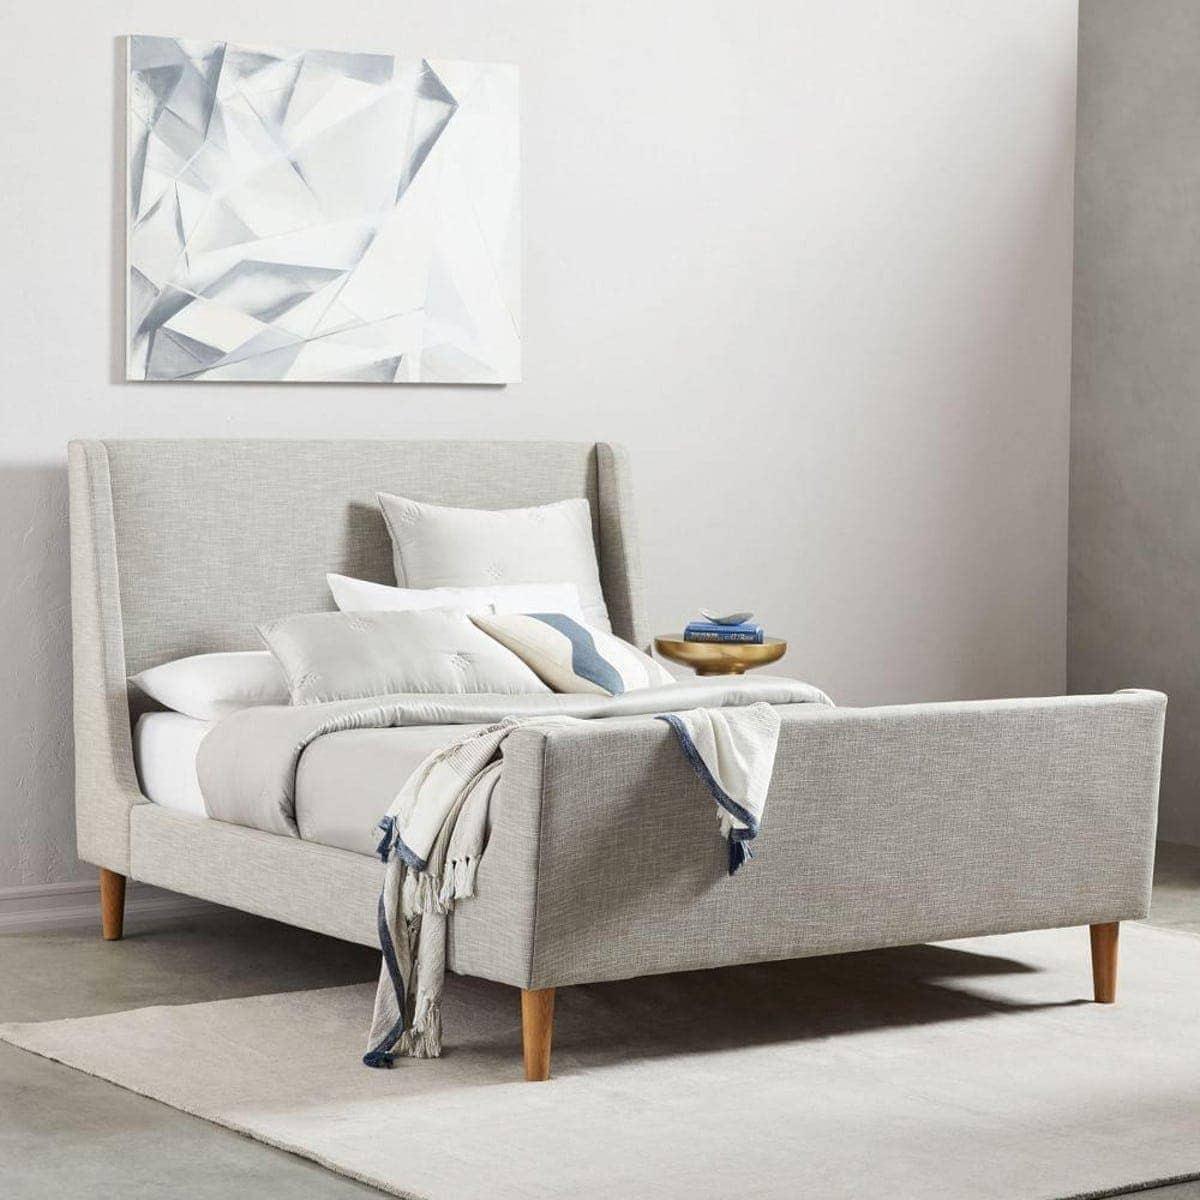 10 Best Upholstered Bedhead Designs Frames Tlc Interiors